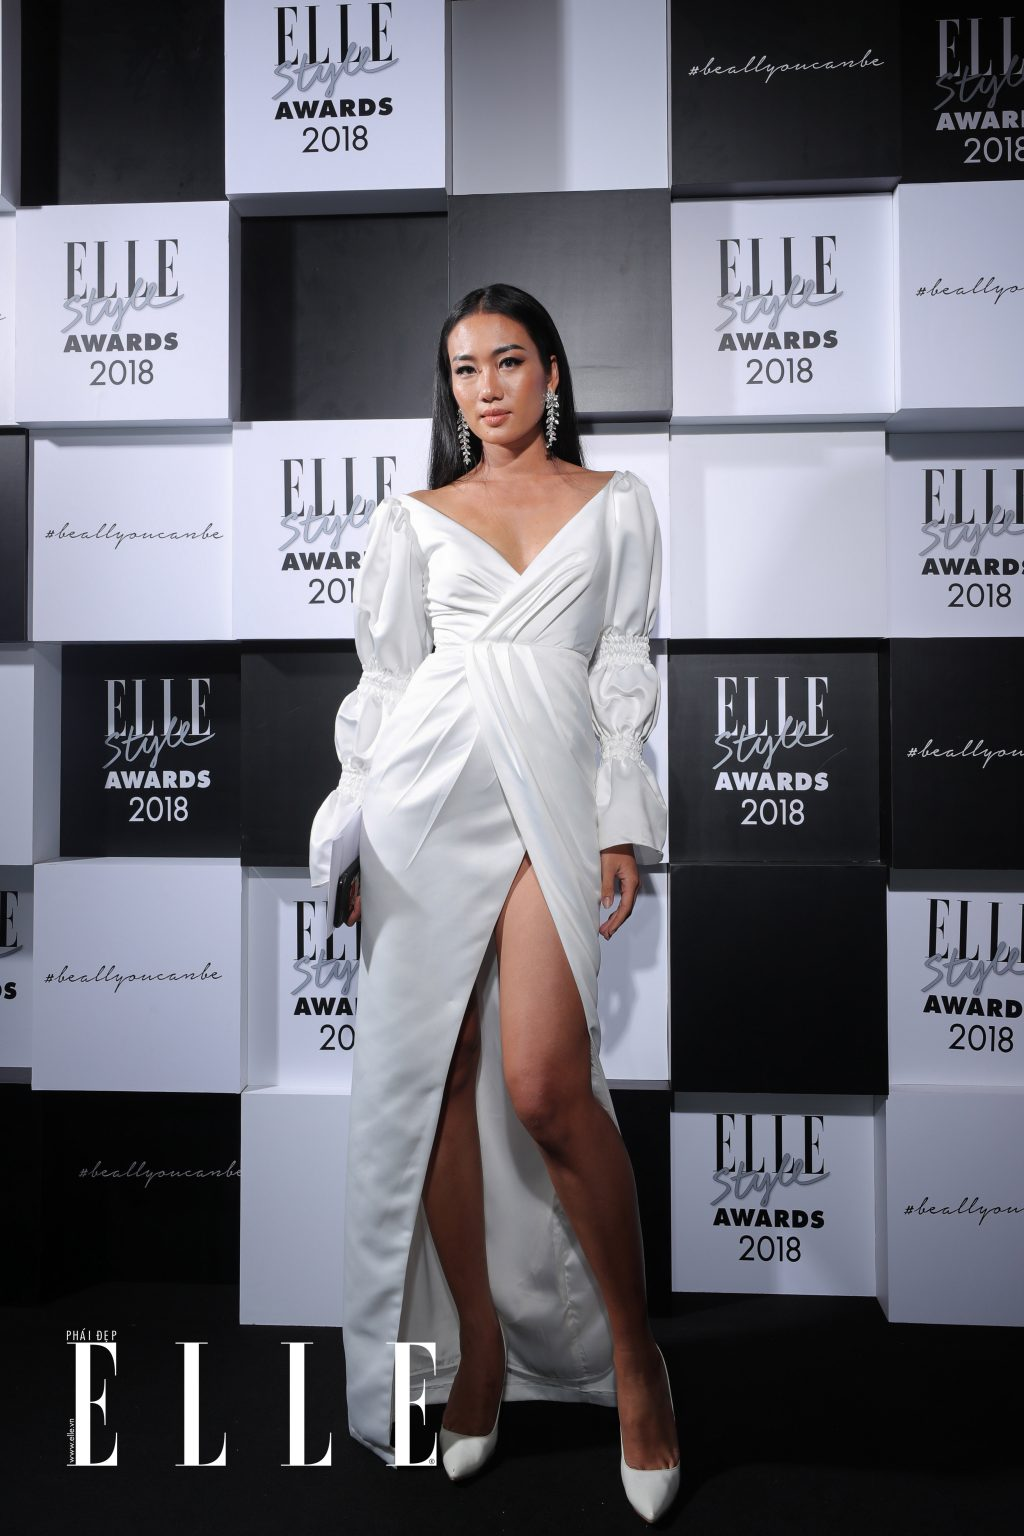 ELLE Style Awards 2018 Nha Truc